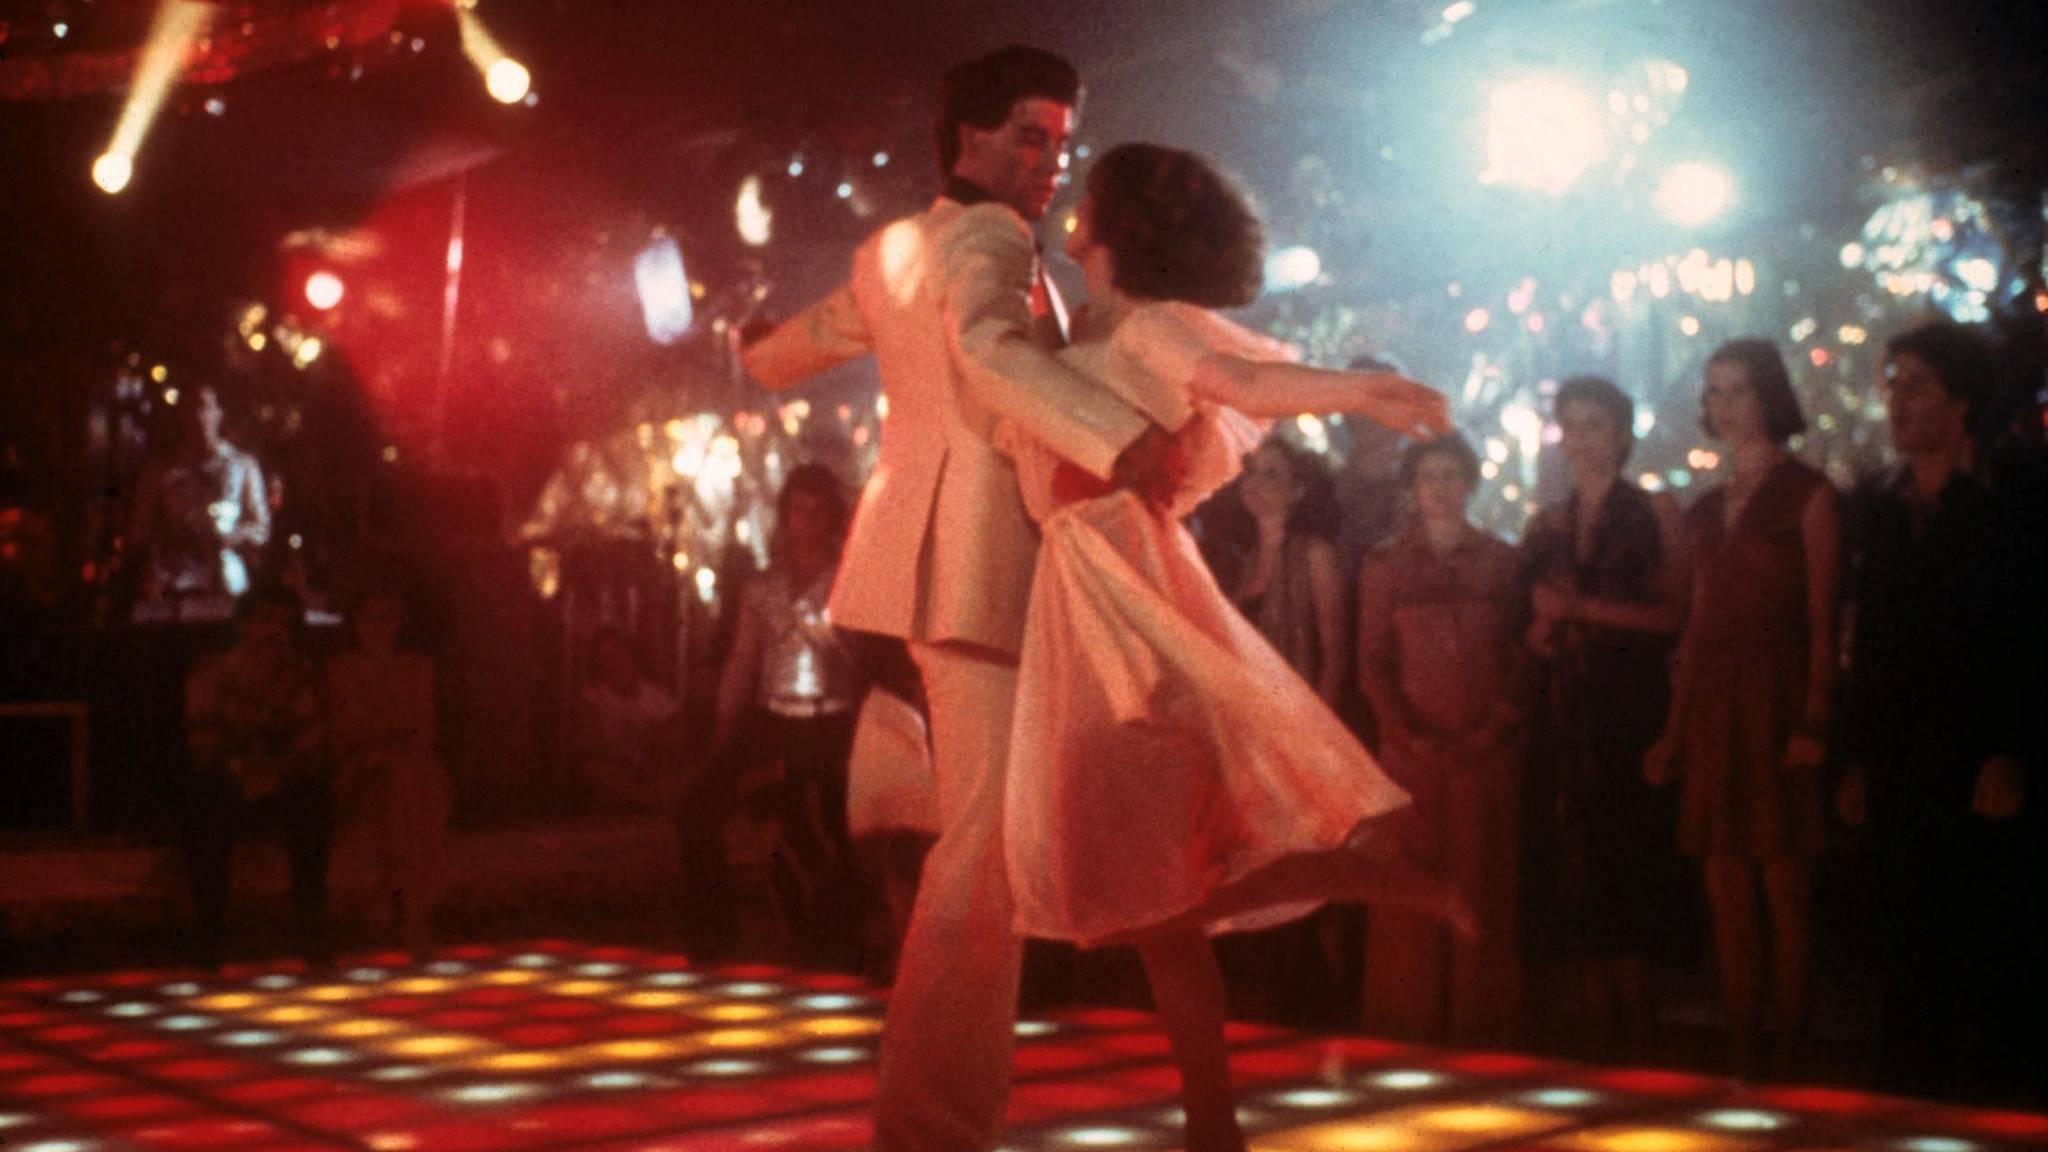 Klassiker Über Saturday Night Fever17 Fakten Den CxBroeWd